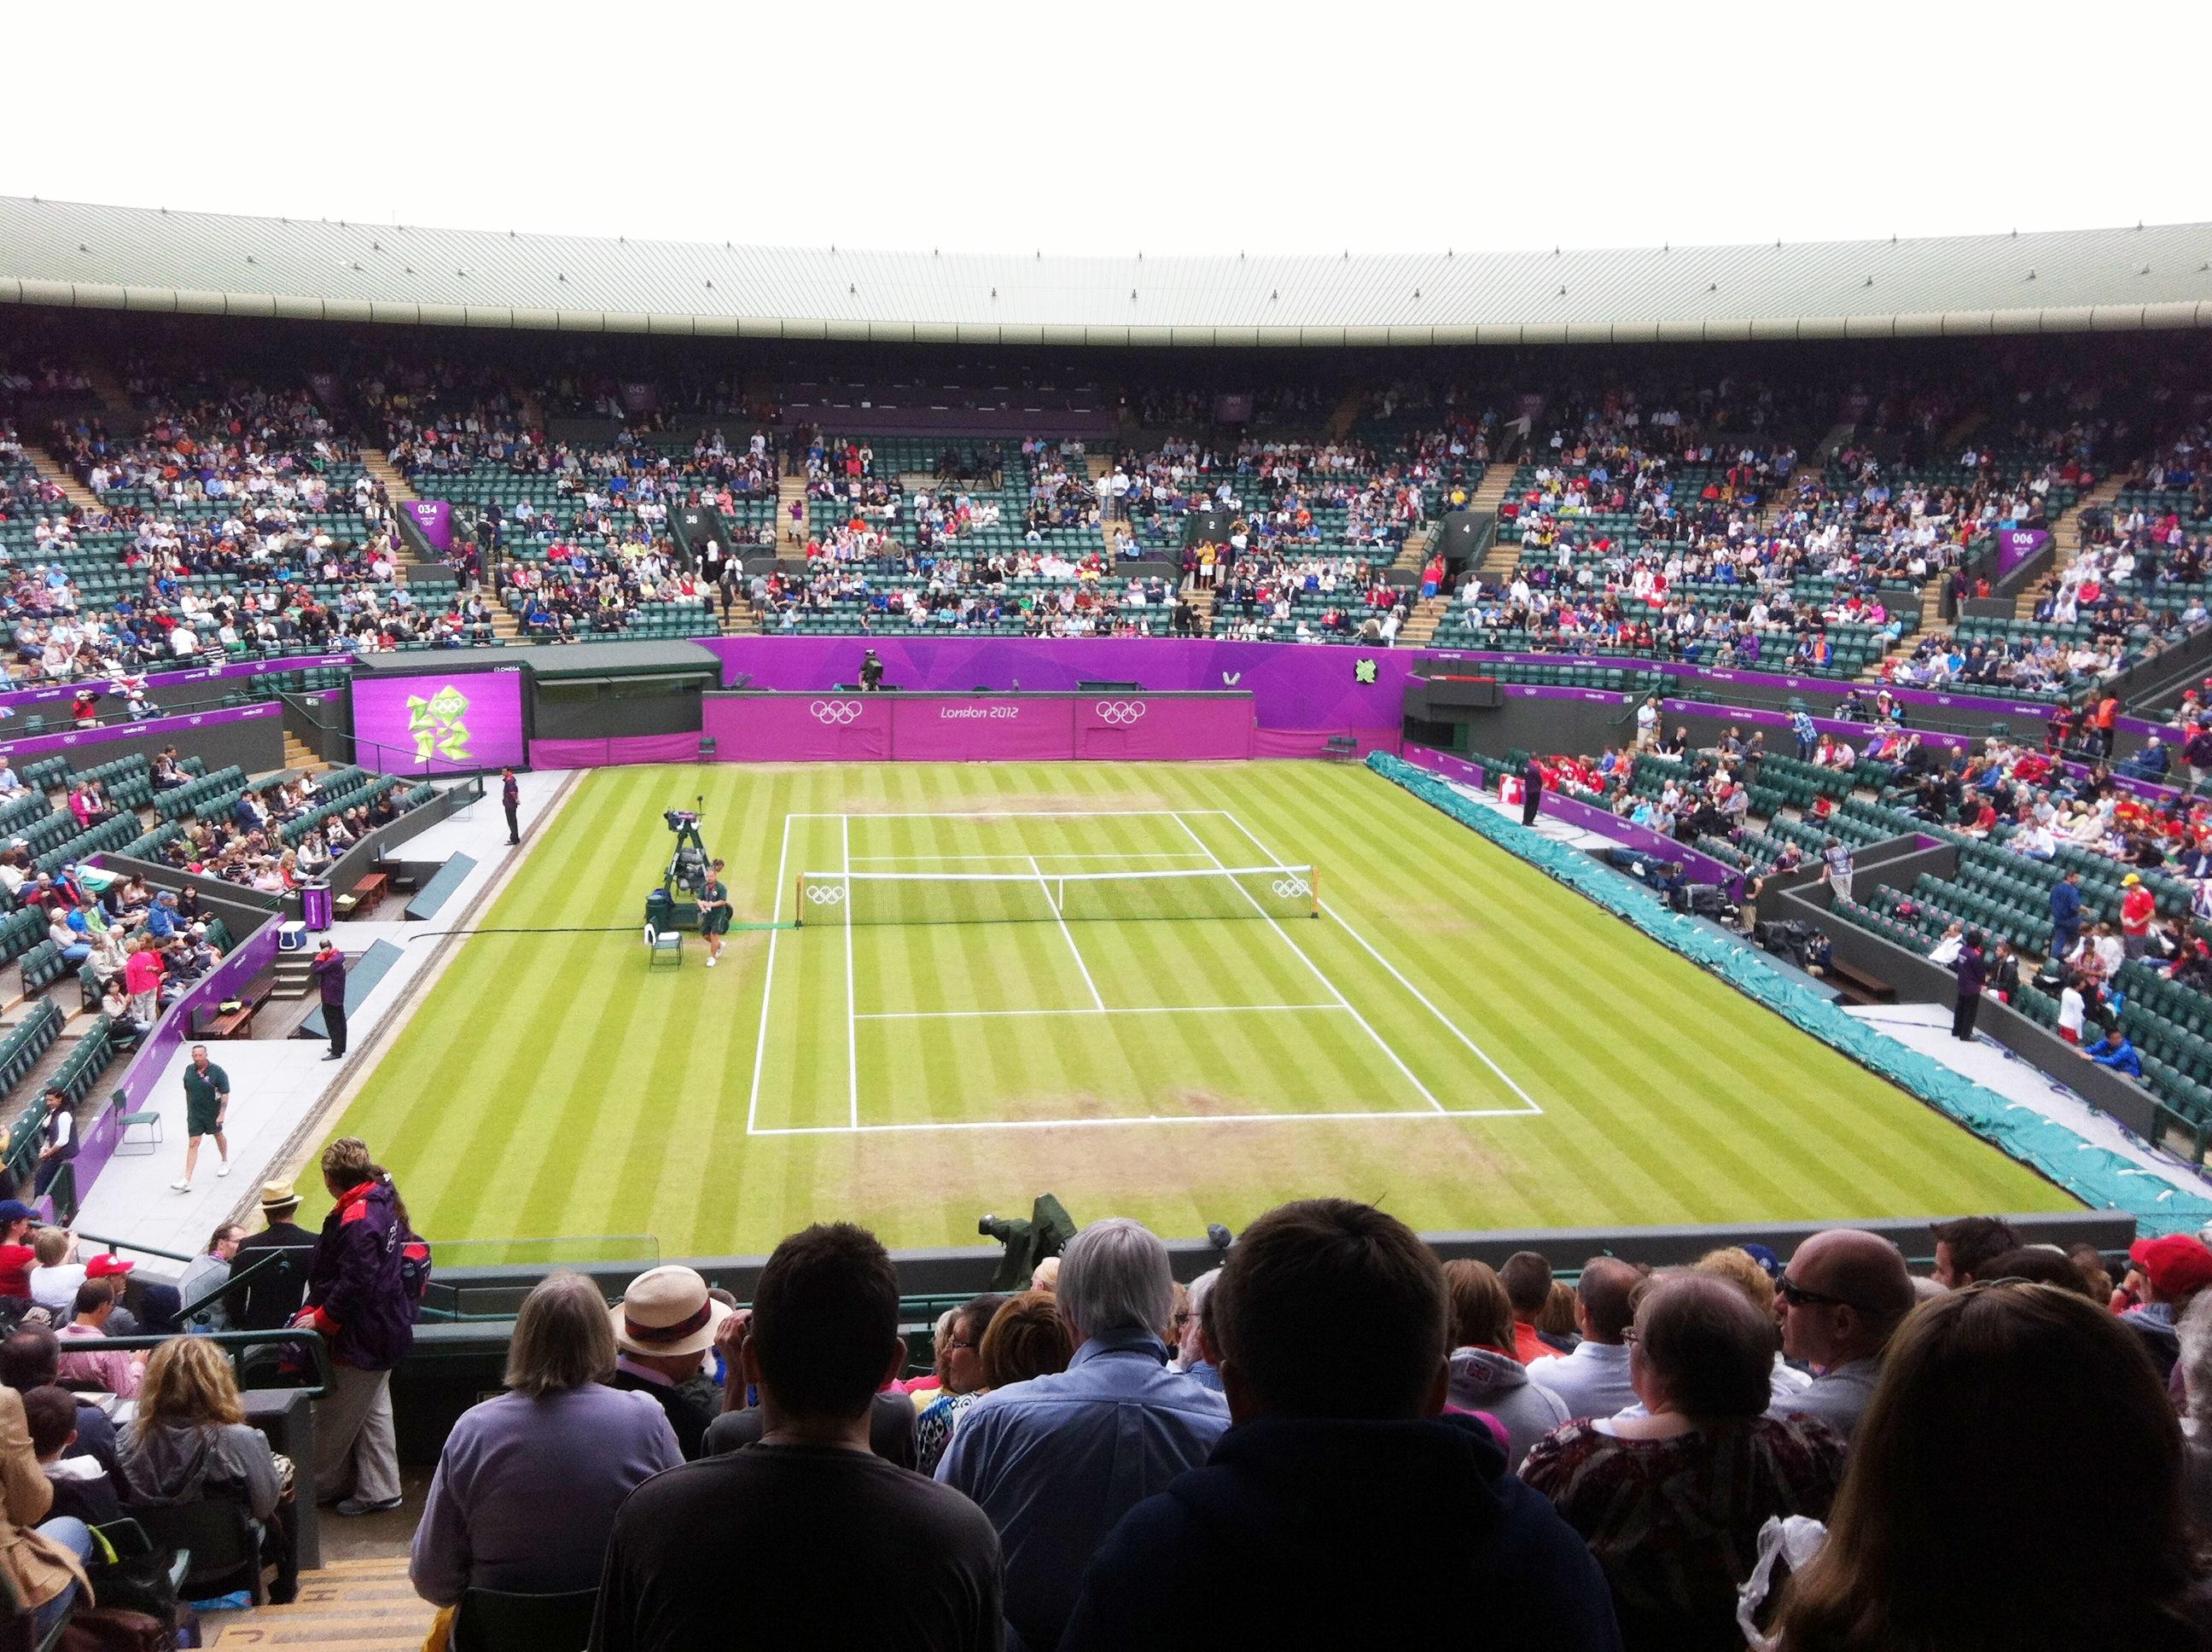 Court 1_Wimbledon_London 2012